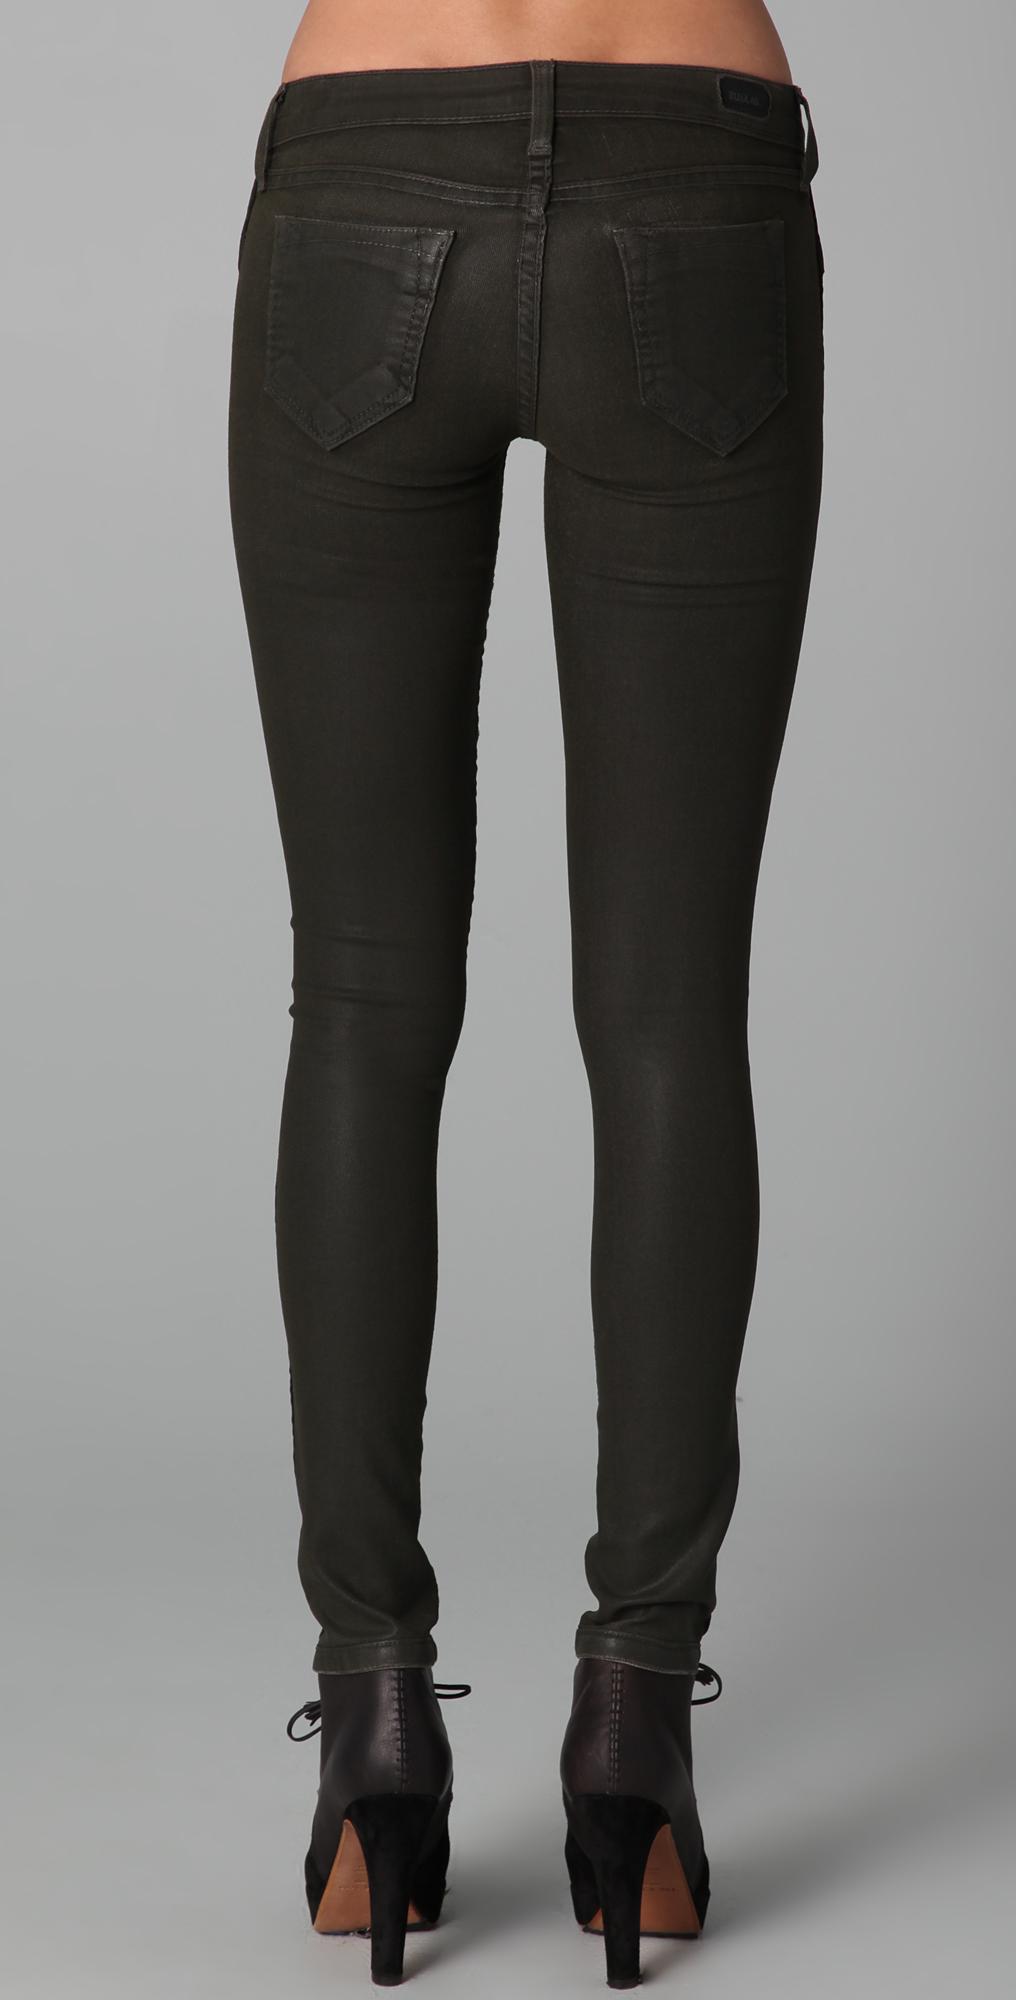 Greatest ONE by Bleulab Reversible Detour Legging Jeans | SHOPBOP TI97